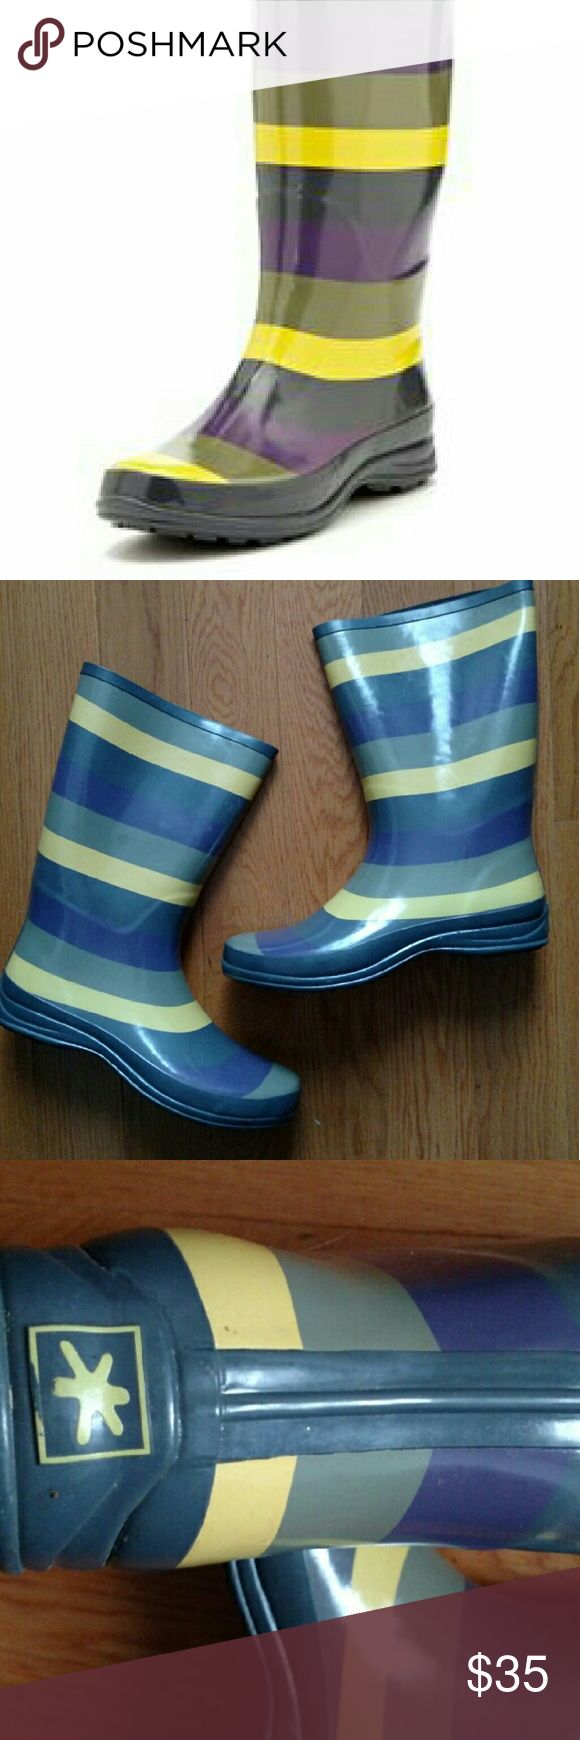 Splendid rain boots Splendid rubber rain boots. Good condition. Gray, purple and yellow. Original box included. Splendid Shoes Winter & Rain Boots